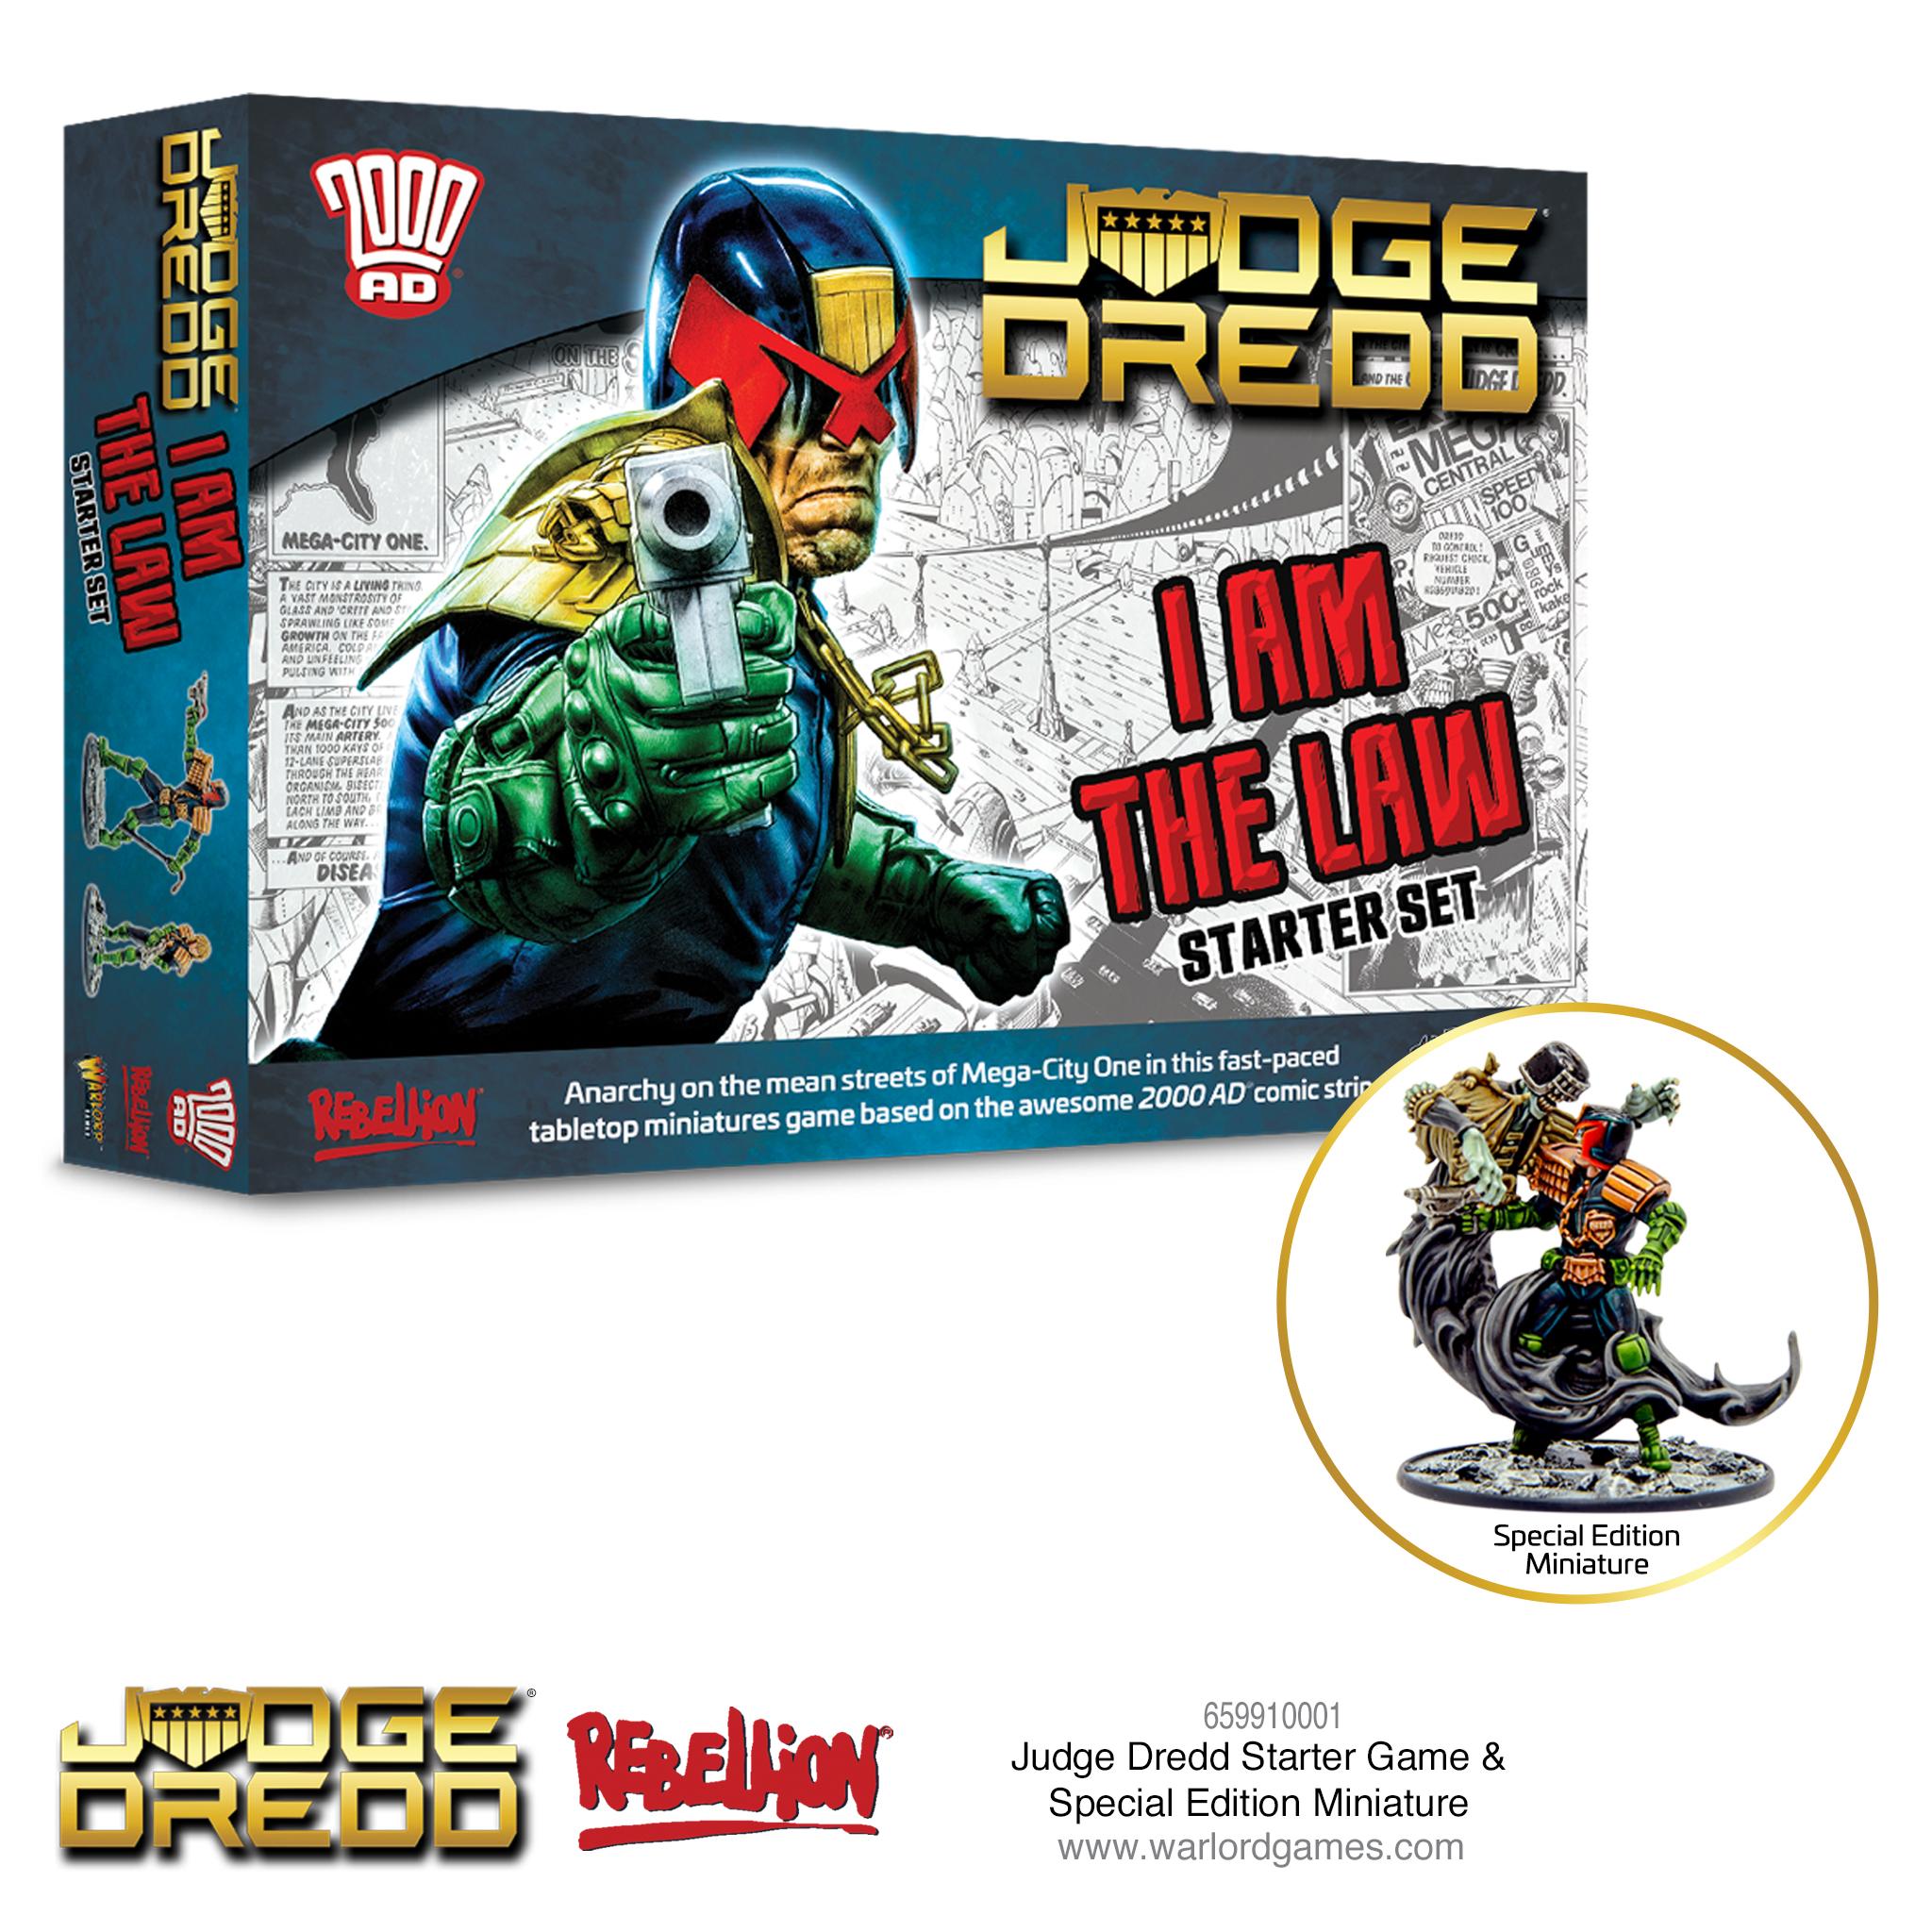 Judge Dredd Starter Game